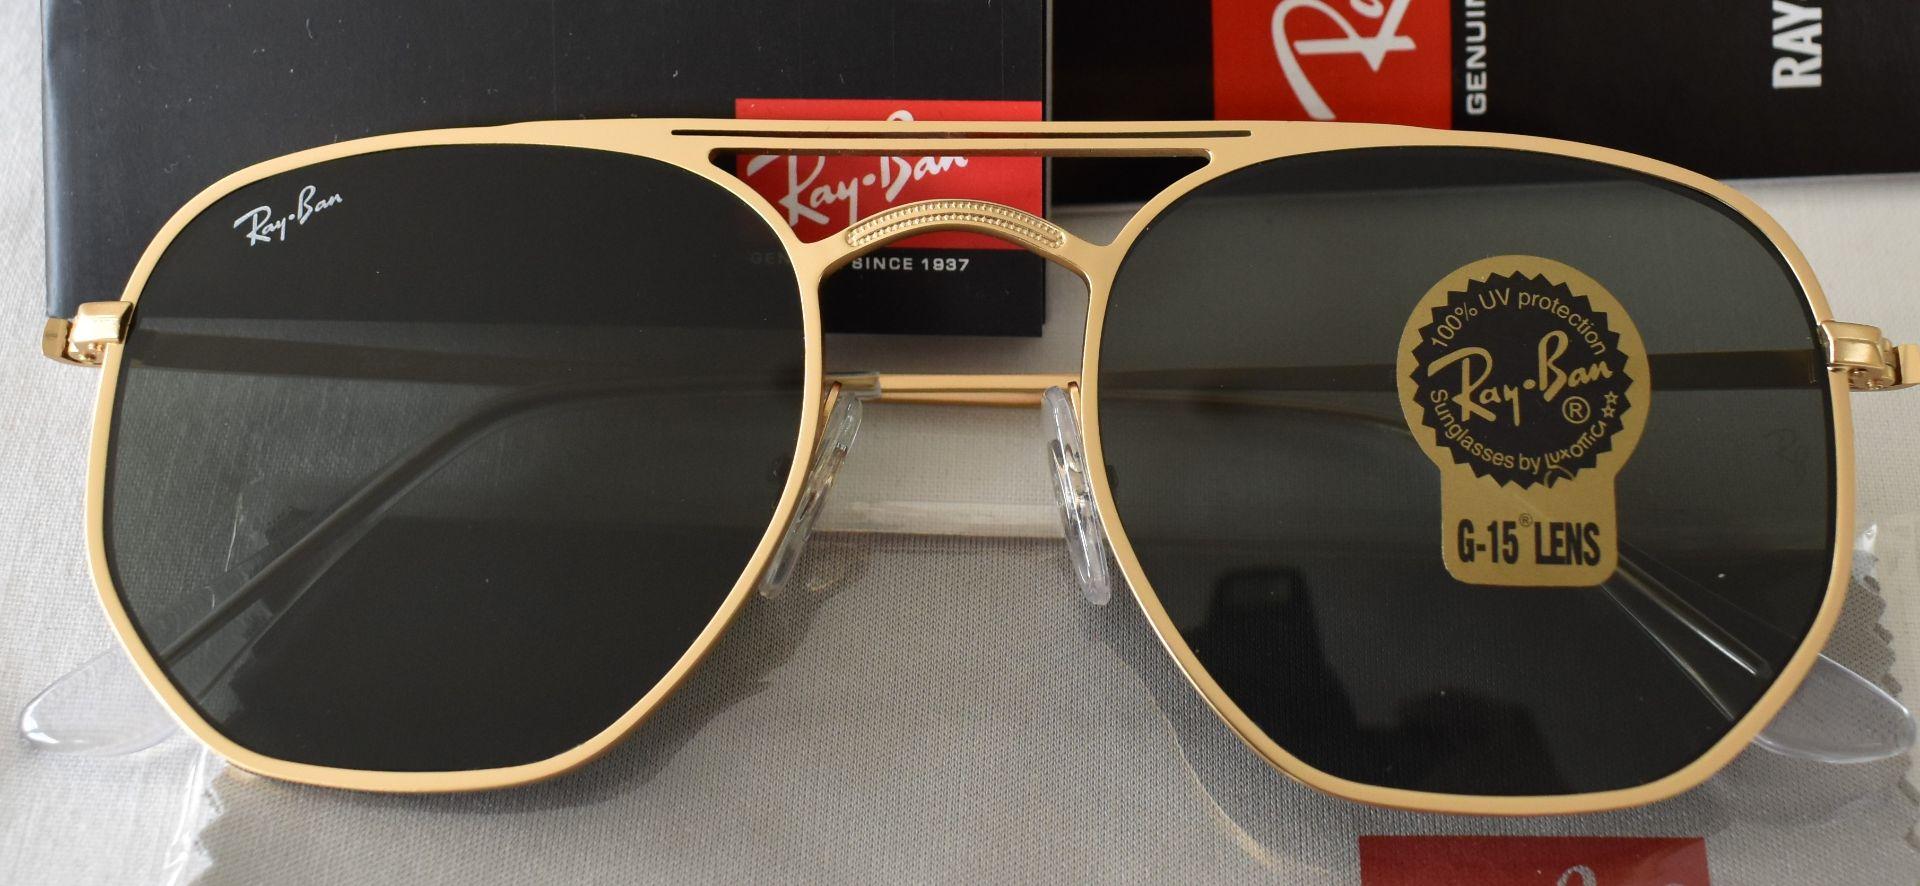 Ray Ban Sunglasses ORB3609 9140/71 *2N - Image 2 of 3